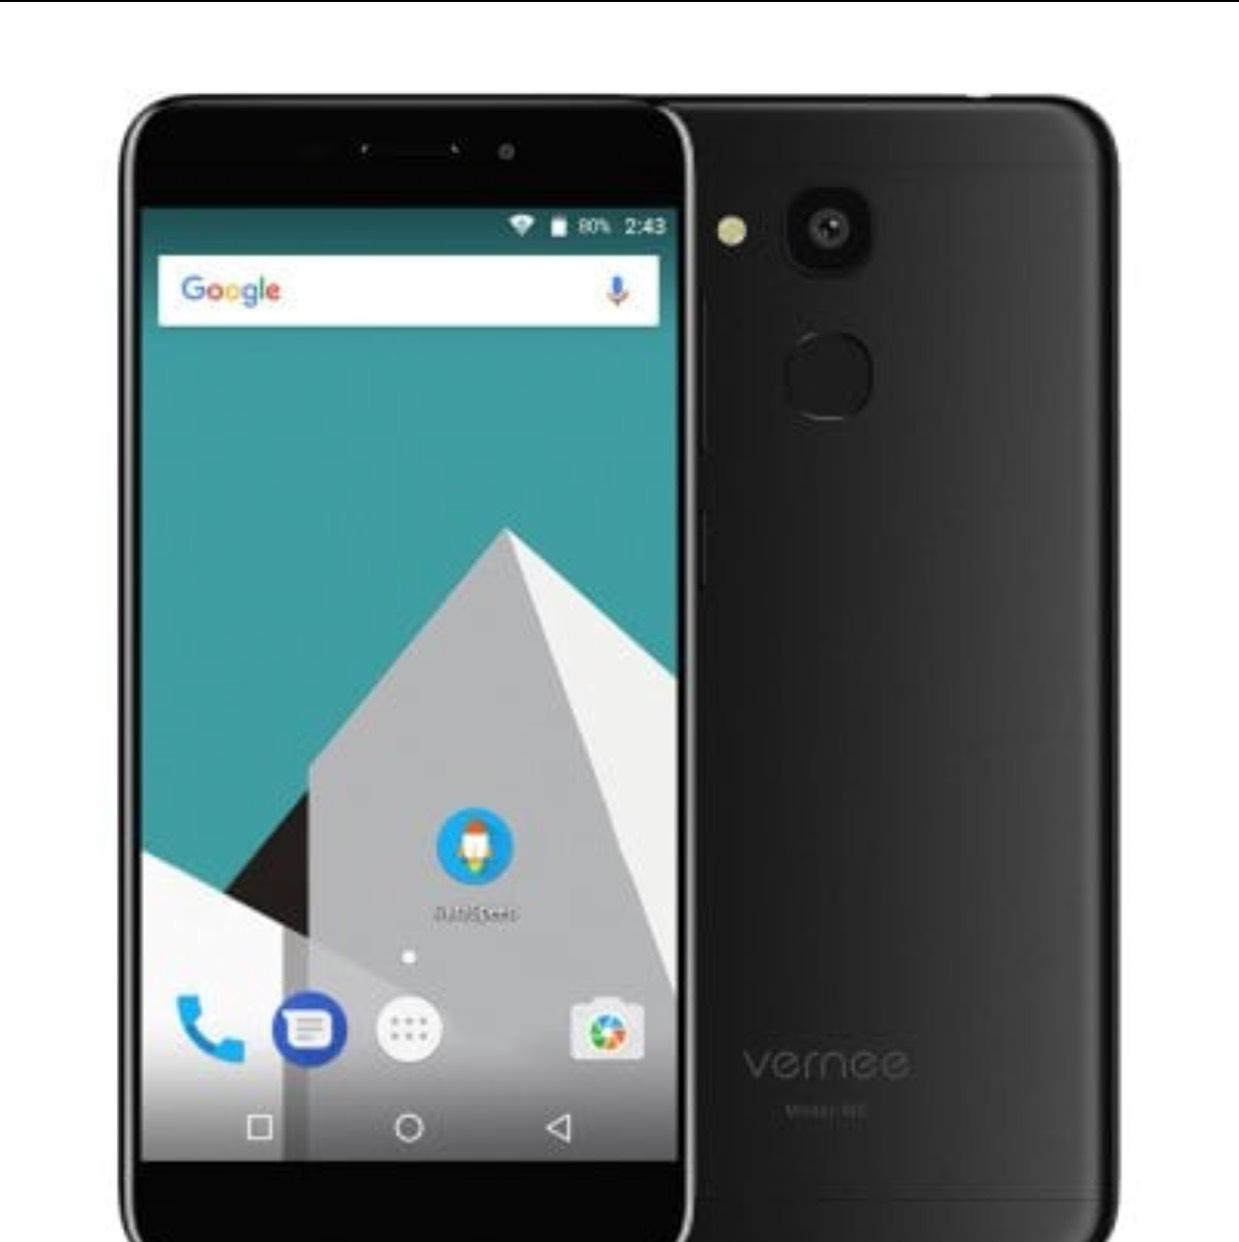 [GearBest] Vernee M5 4G B20 Smartphone Android 7.0 5.2 inch MTK6750 Octa Core 1.5GHz 4GB RAM 64GB ROM Fingerprint Scanner 13.0MP Rear Cam 100,54€ (kein FHD)